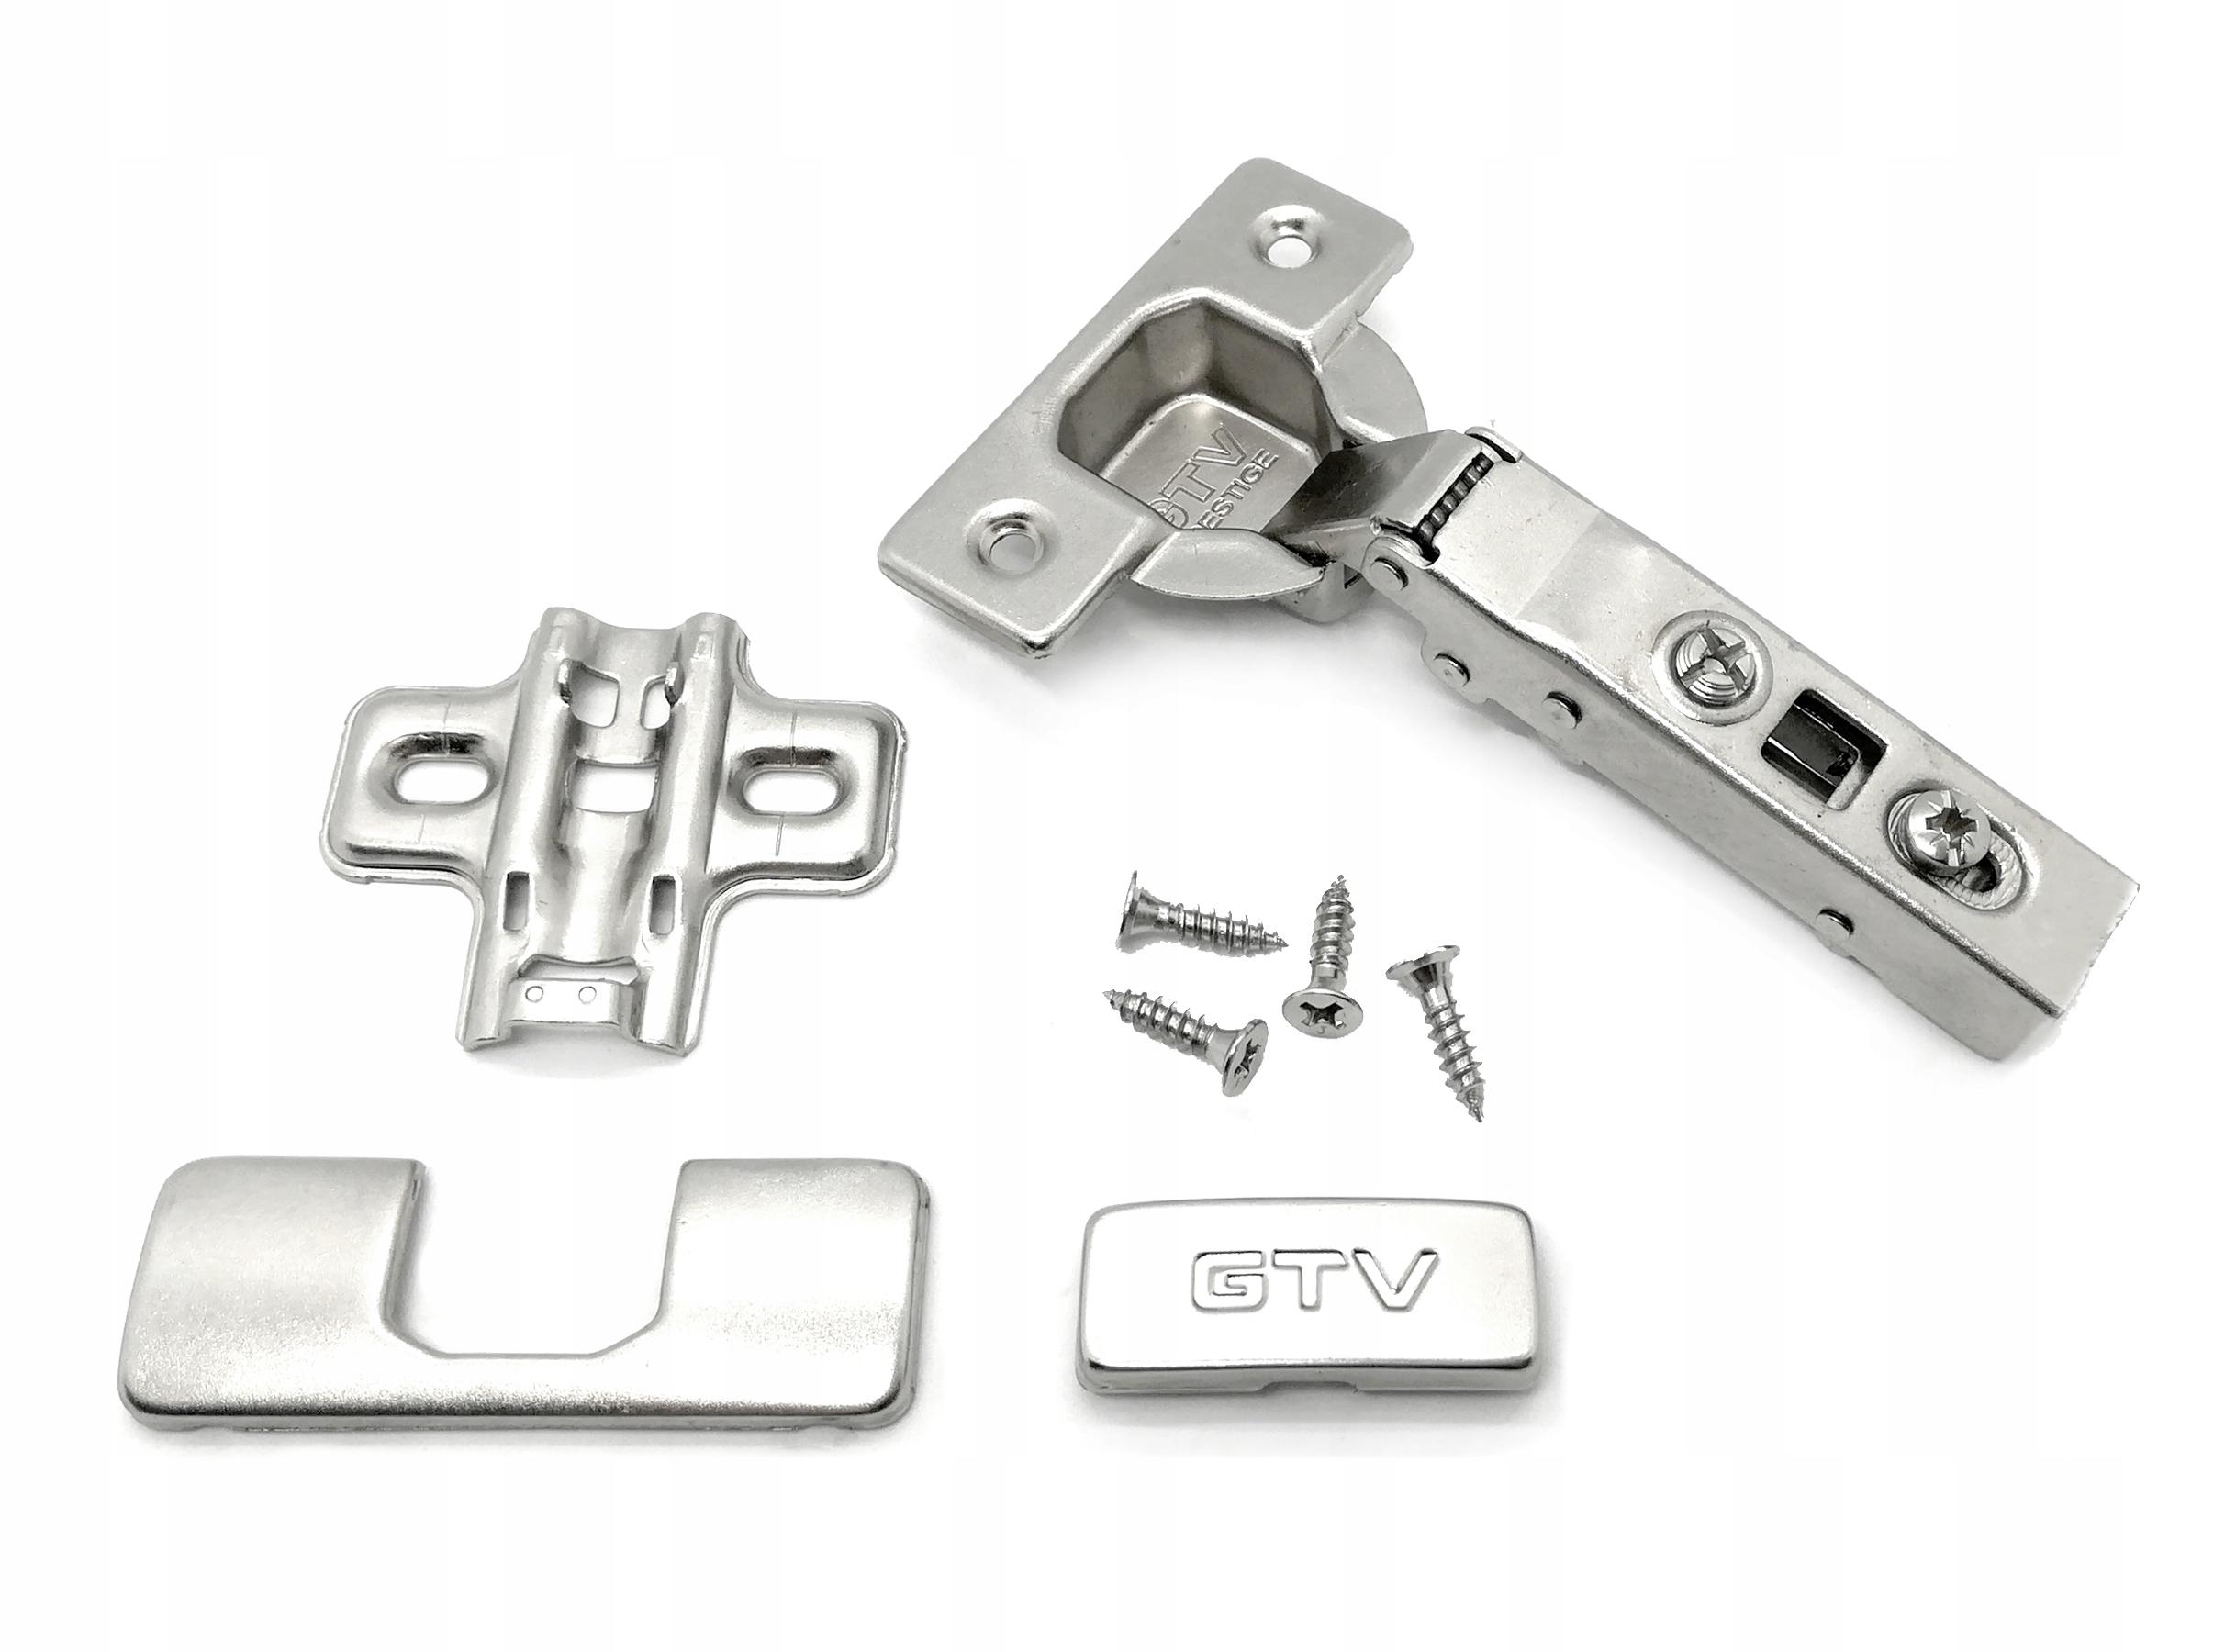 Петля накладная мебельная GTV PRESTIGE для бесшумного закрывания